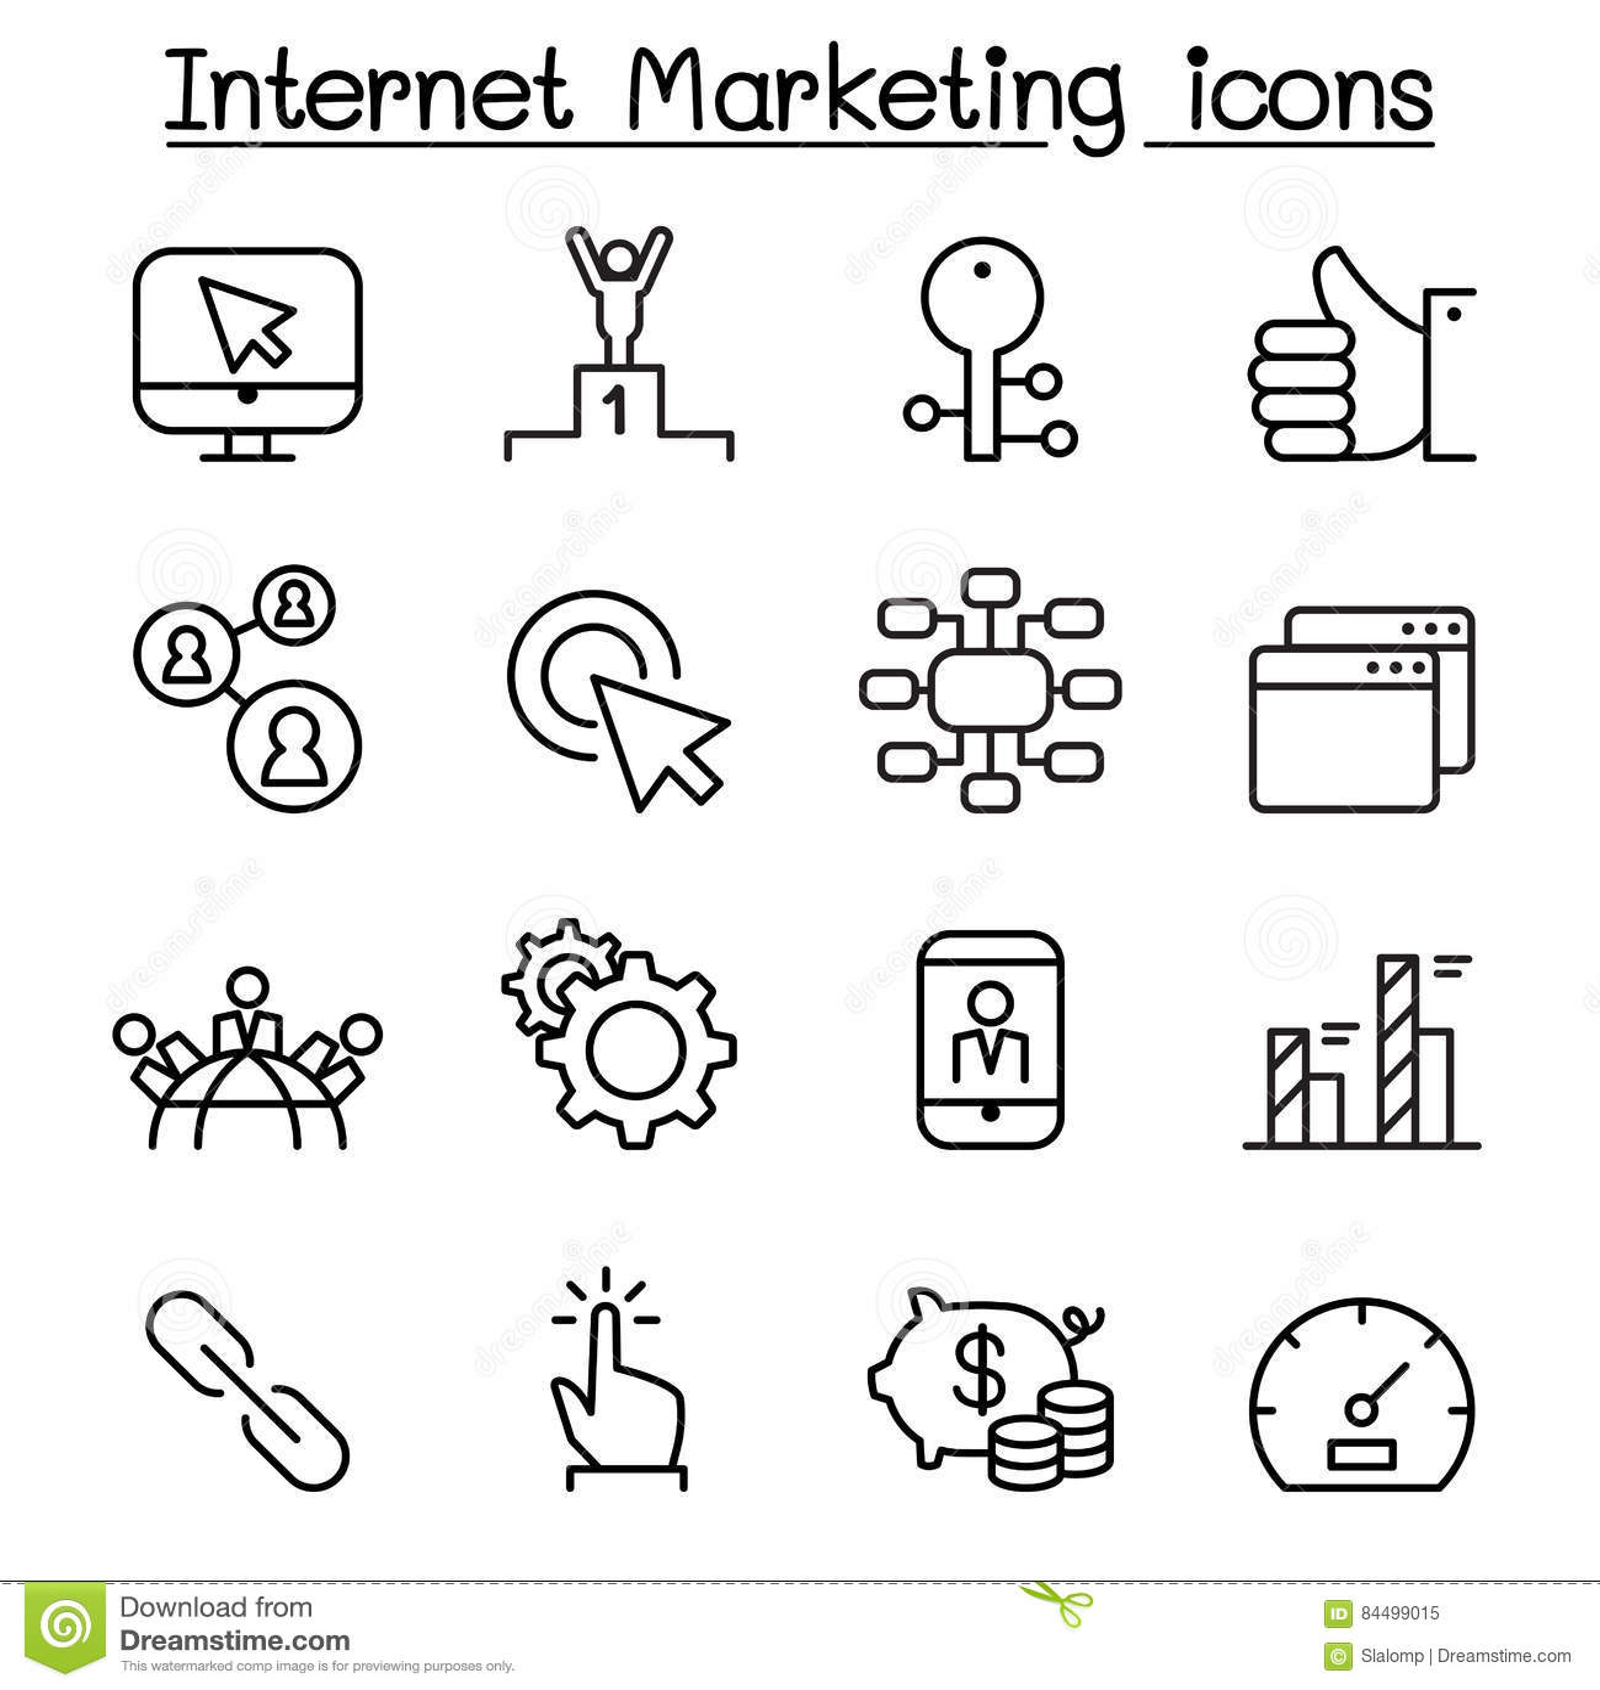 SEO & internet marketing icon set in thin line style